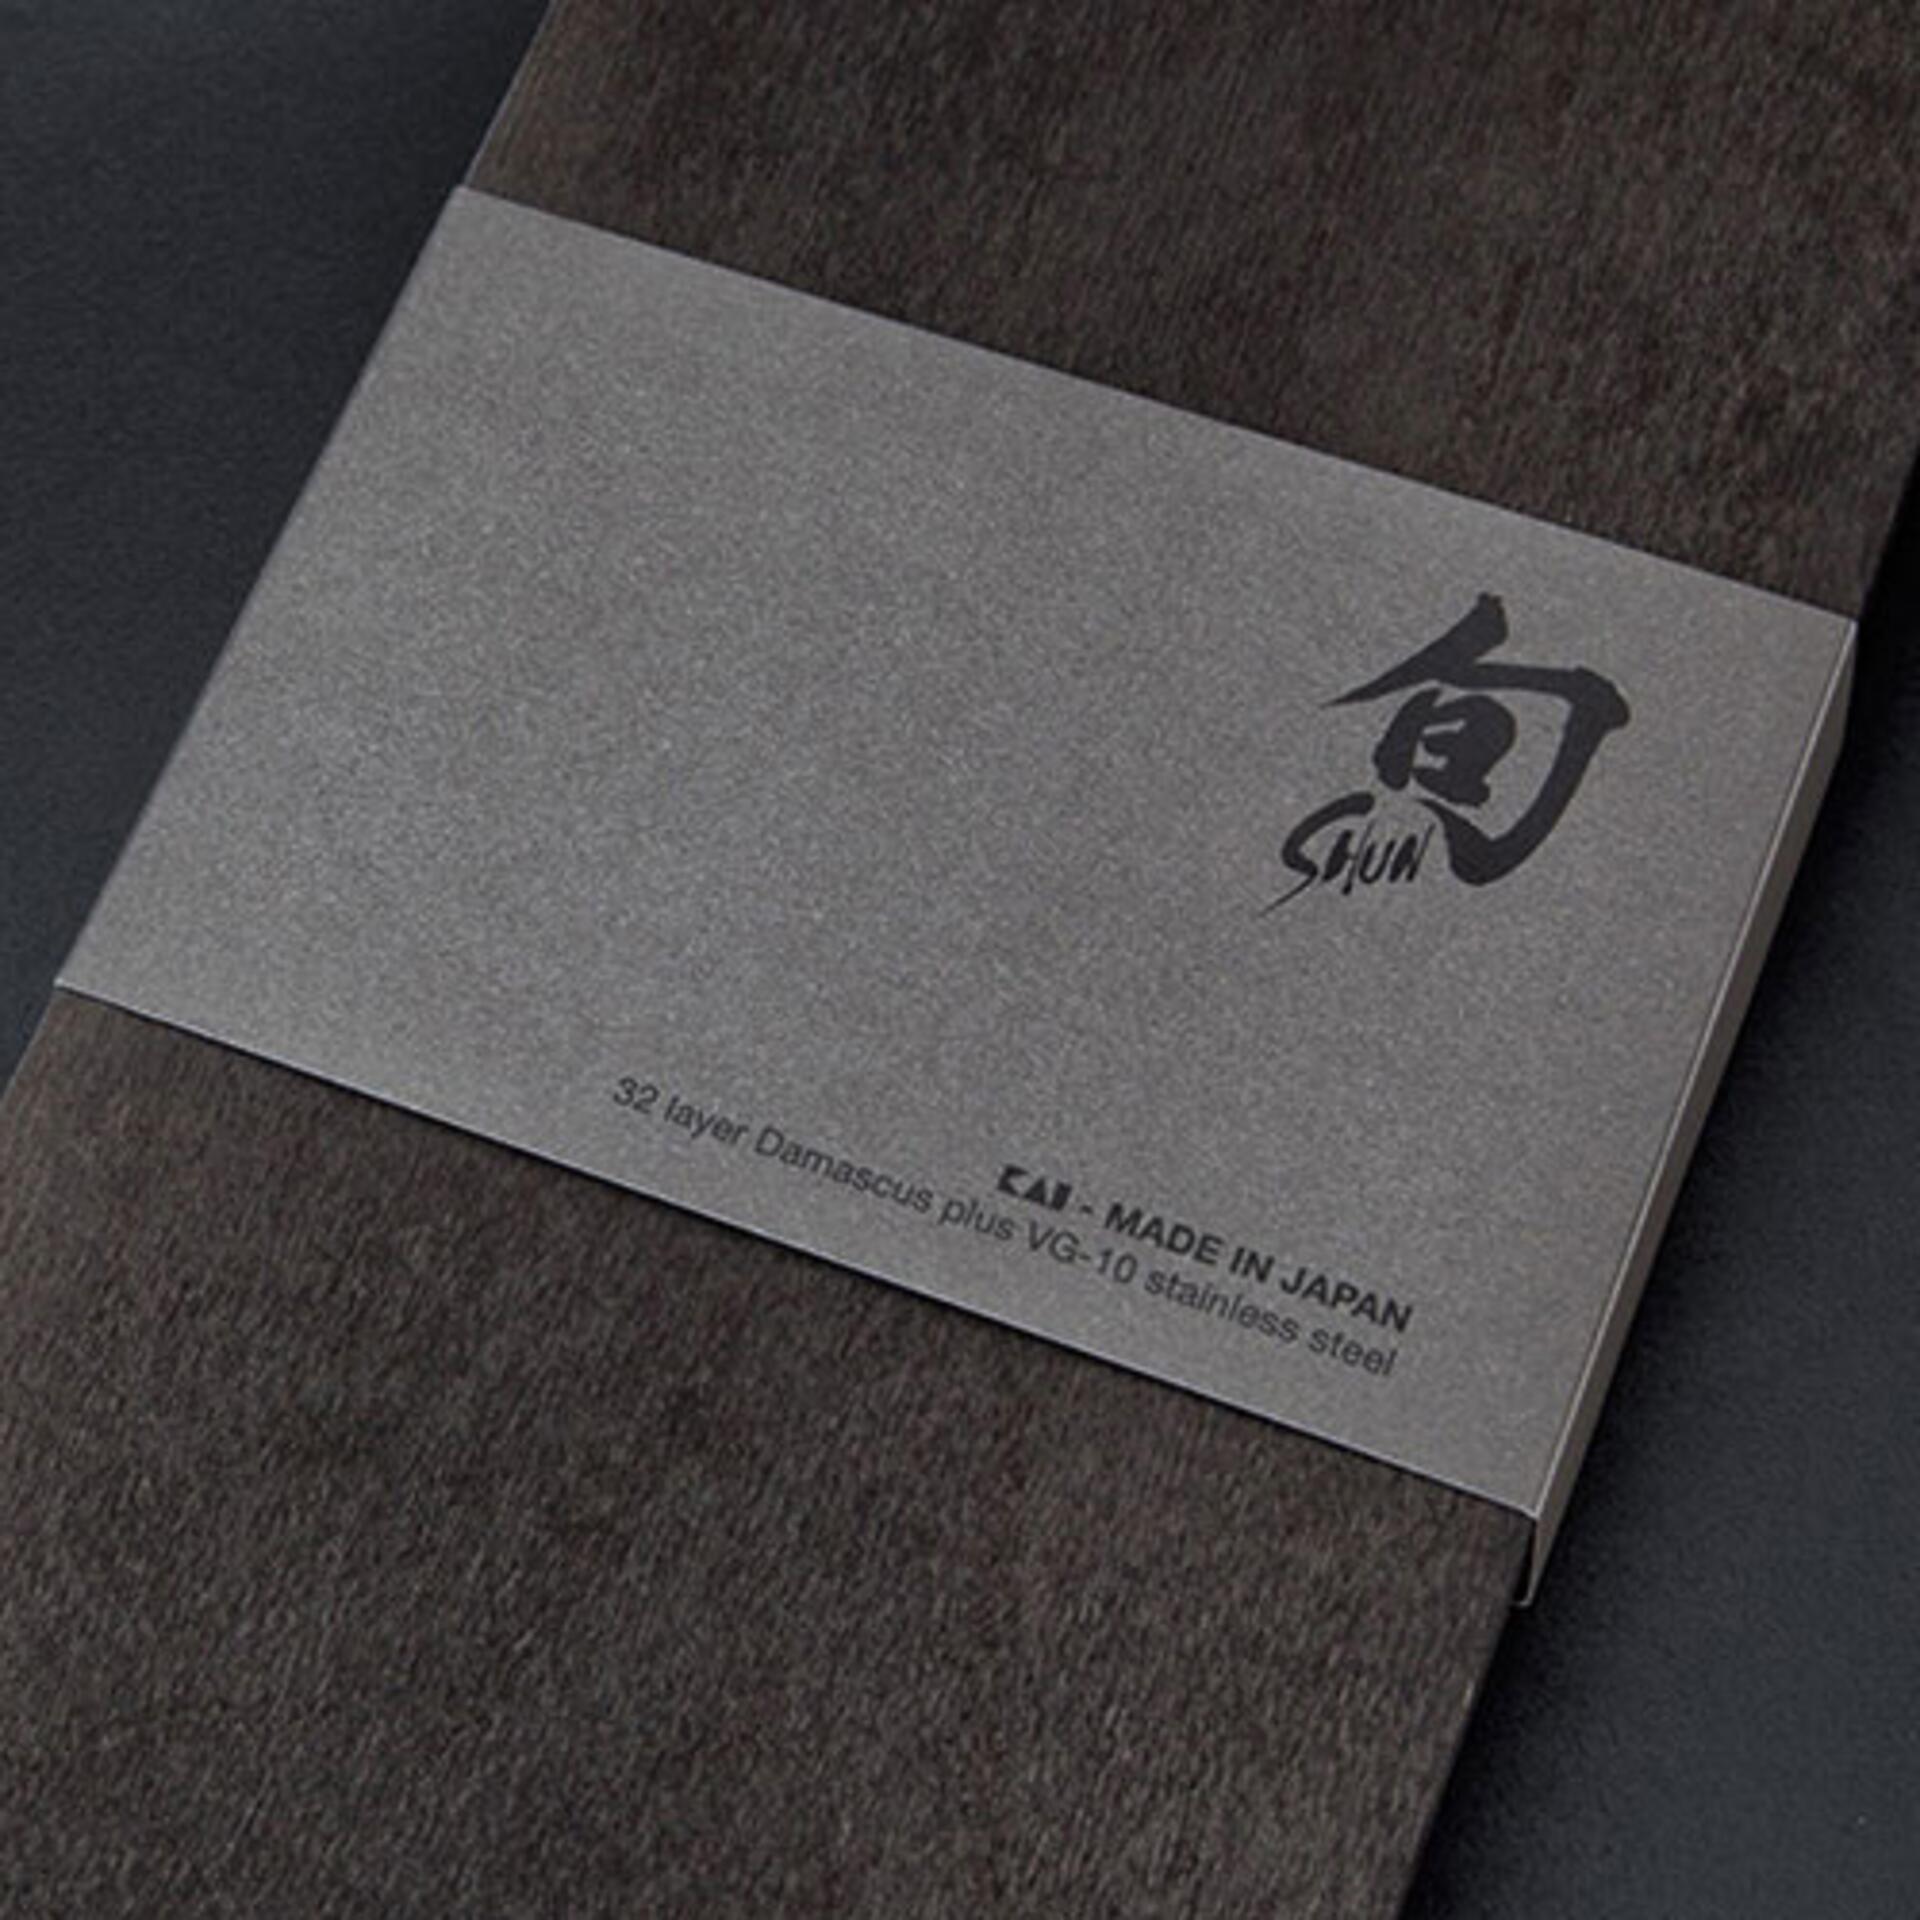 KAI Shun Classic Kochmesser DM-0706